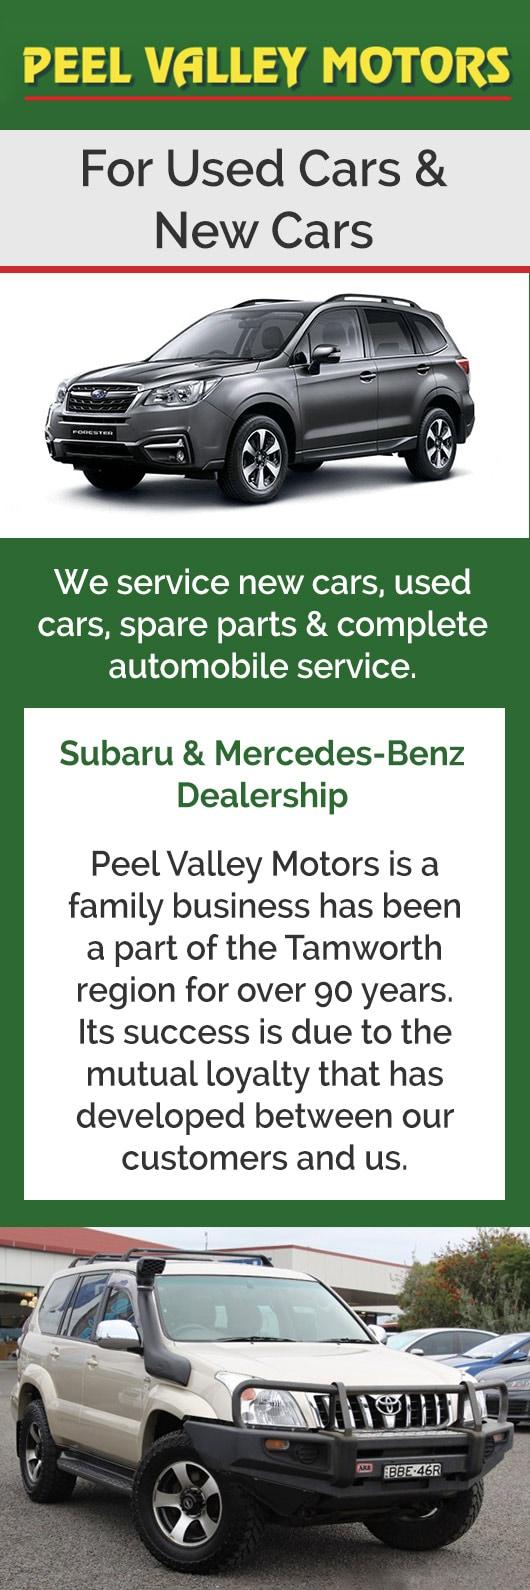 Peel Valley Motors New Car Dealers Gunnedah Rd Tamworth - Subaru valley motors